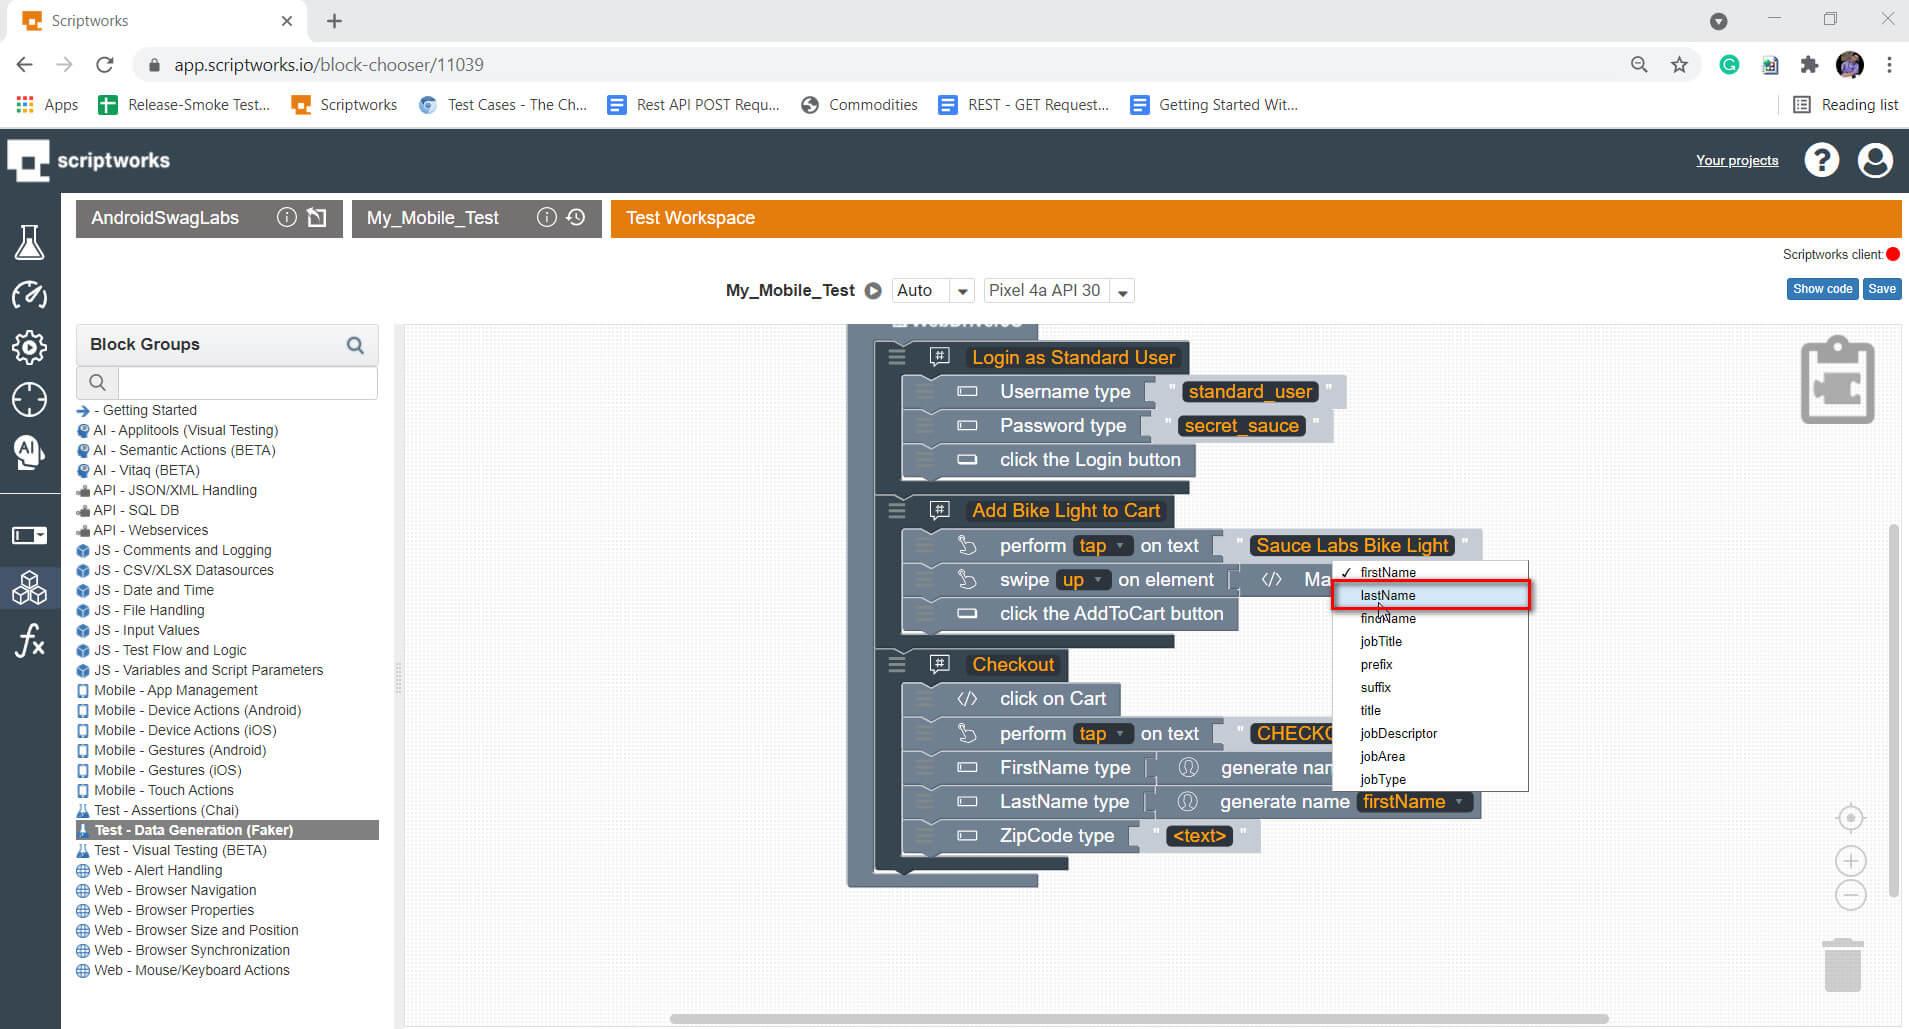 Screenshot for selecting lastname from faker